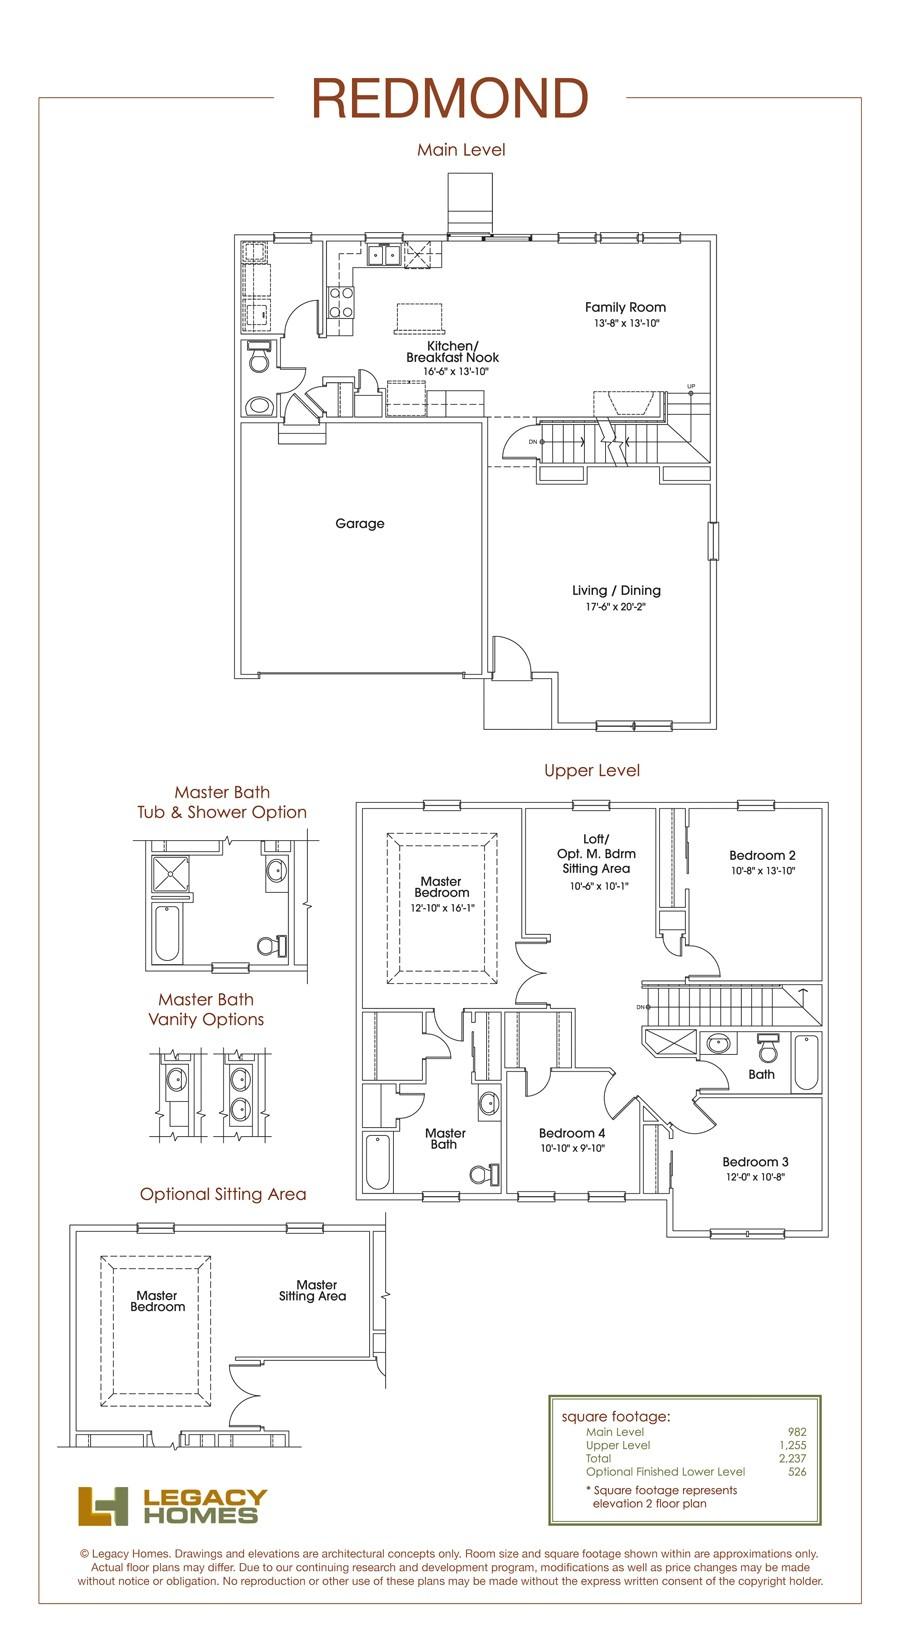 hearthstone homes omaha floor plans beautiful redmond floor plan legacy homes omaha and lincoln